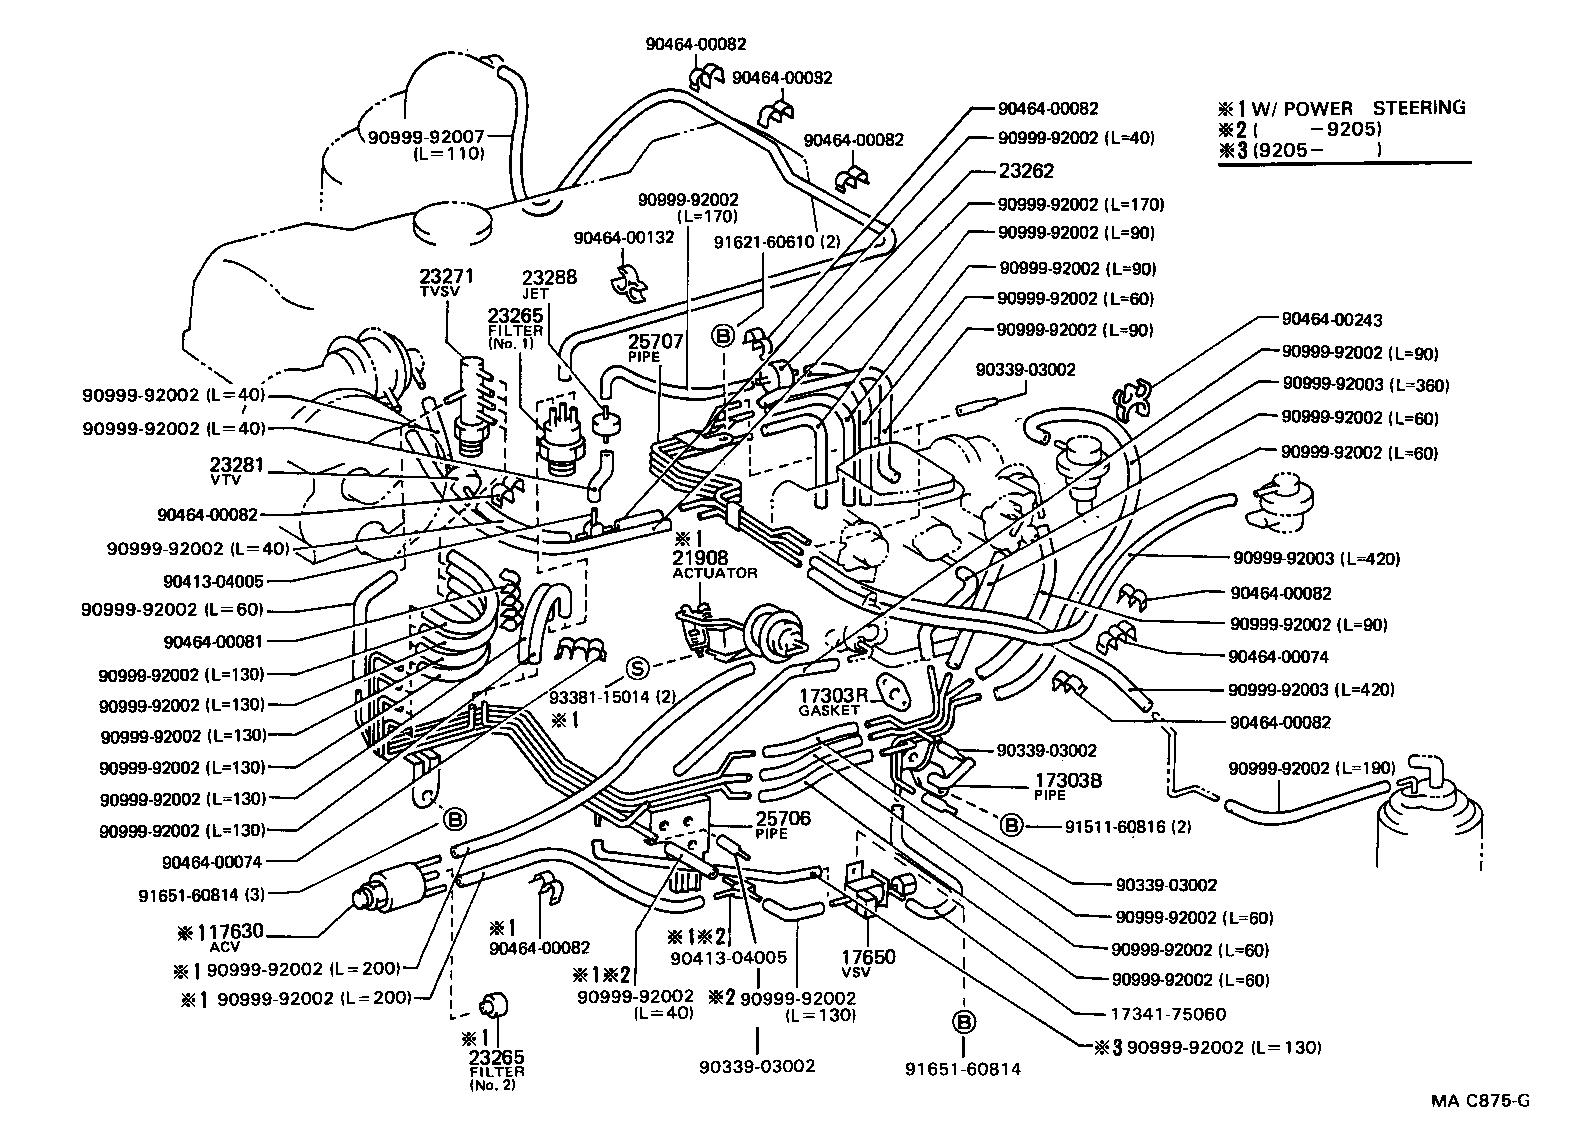 40V40 1403] 19409 Toyota Van Engine Diagram   ground scenario wiring ...